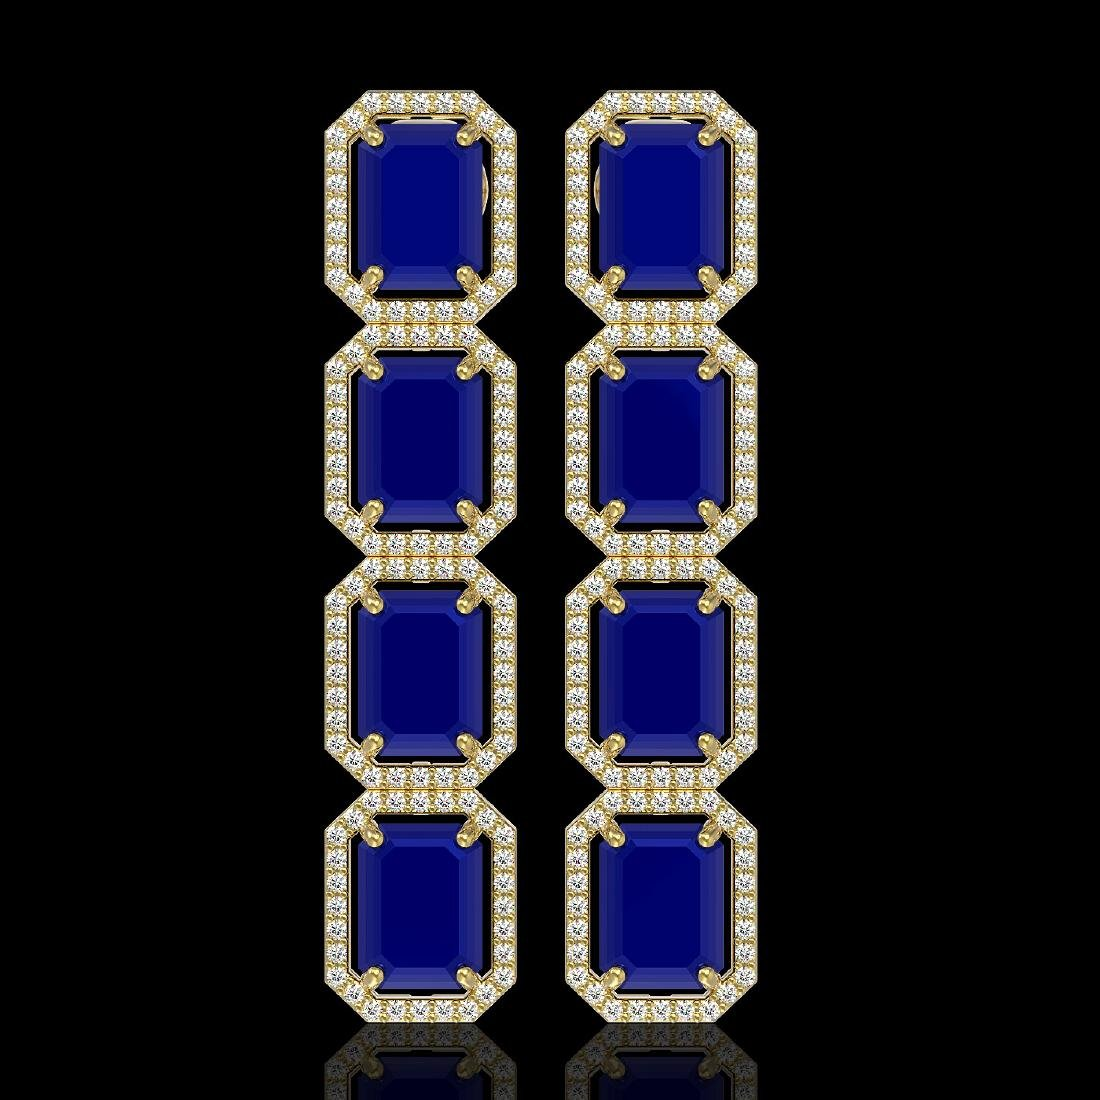 20.59 CTW Sapphire & Diamond Halo Earrings 10K Yellow